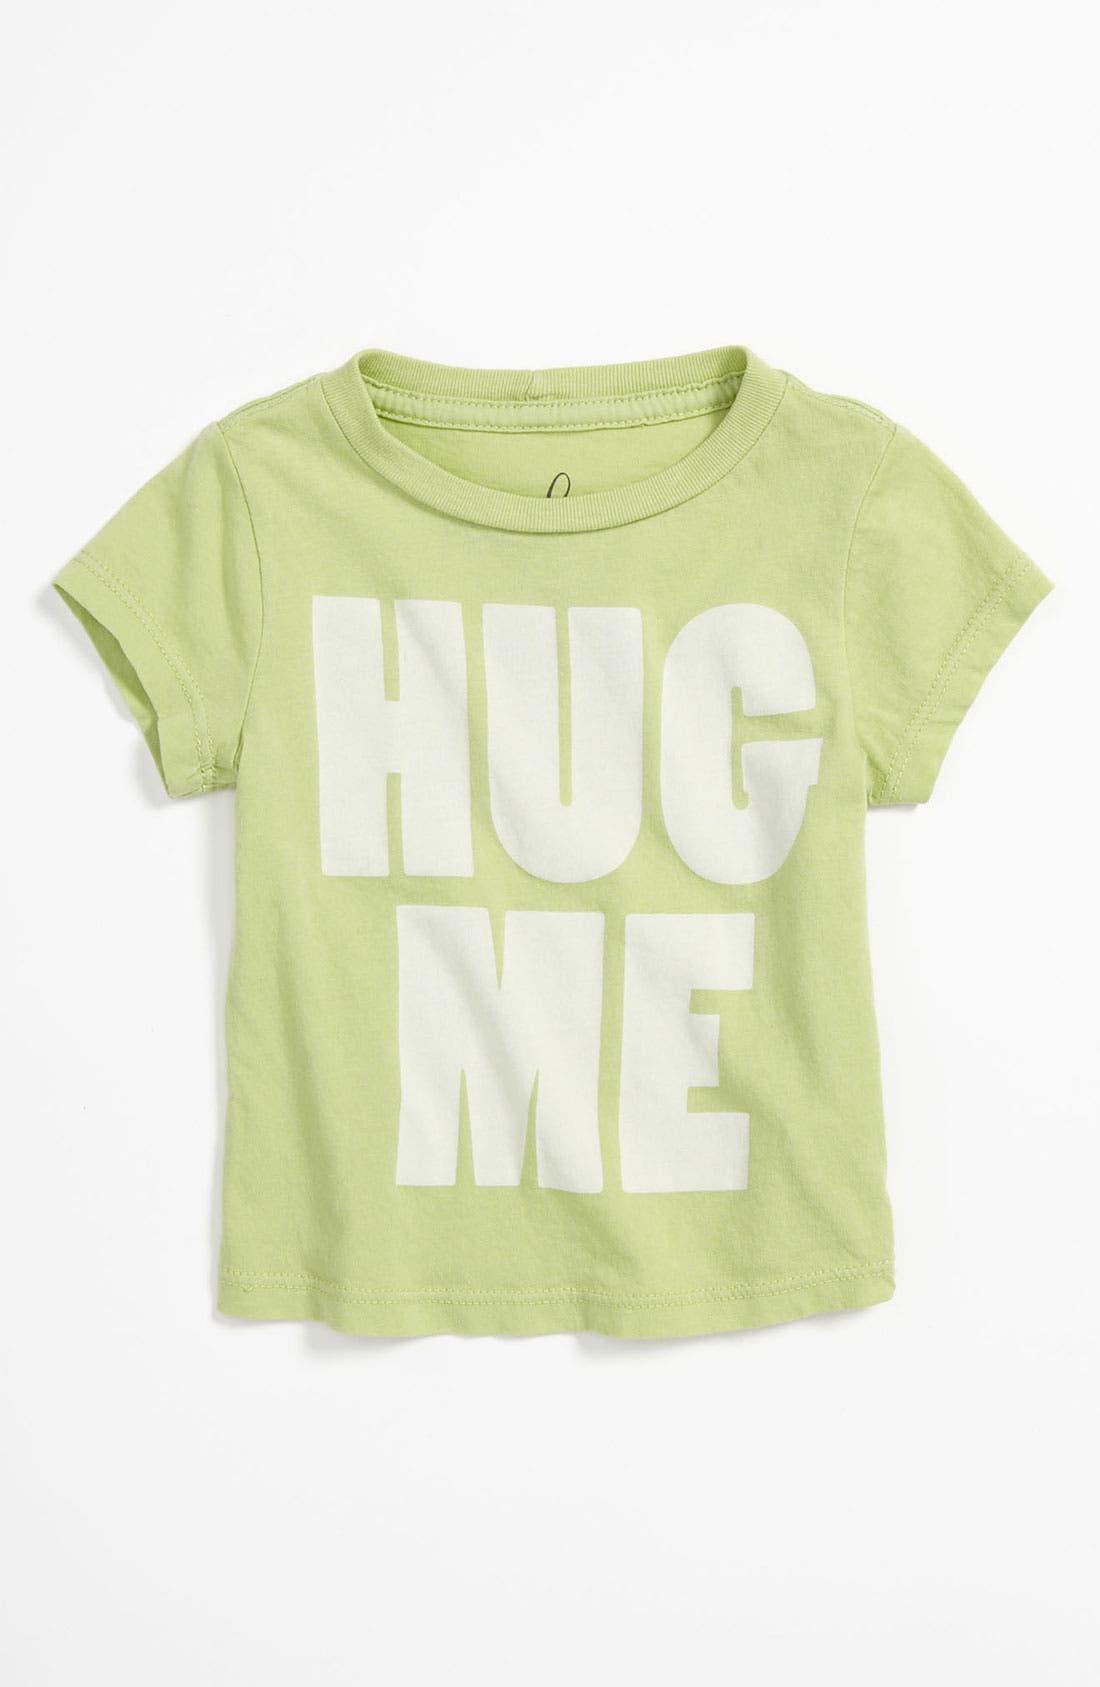 Alternate Image 1 Selected - Peek 'Little Peanut - Hug Me' T-Shirt (Baby)